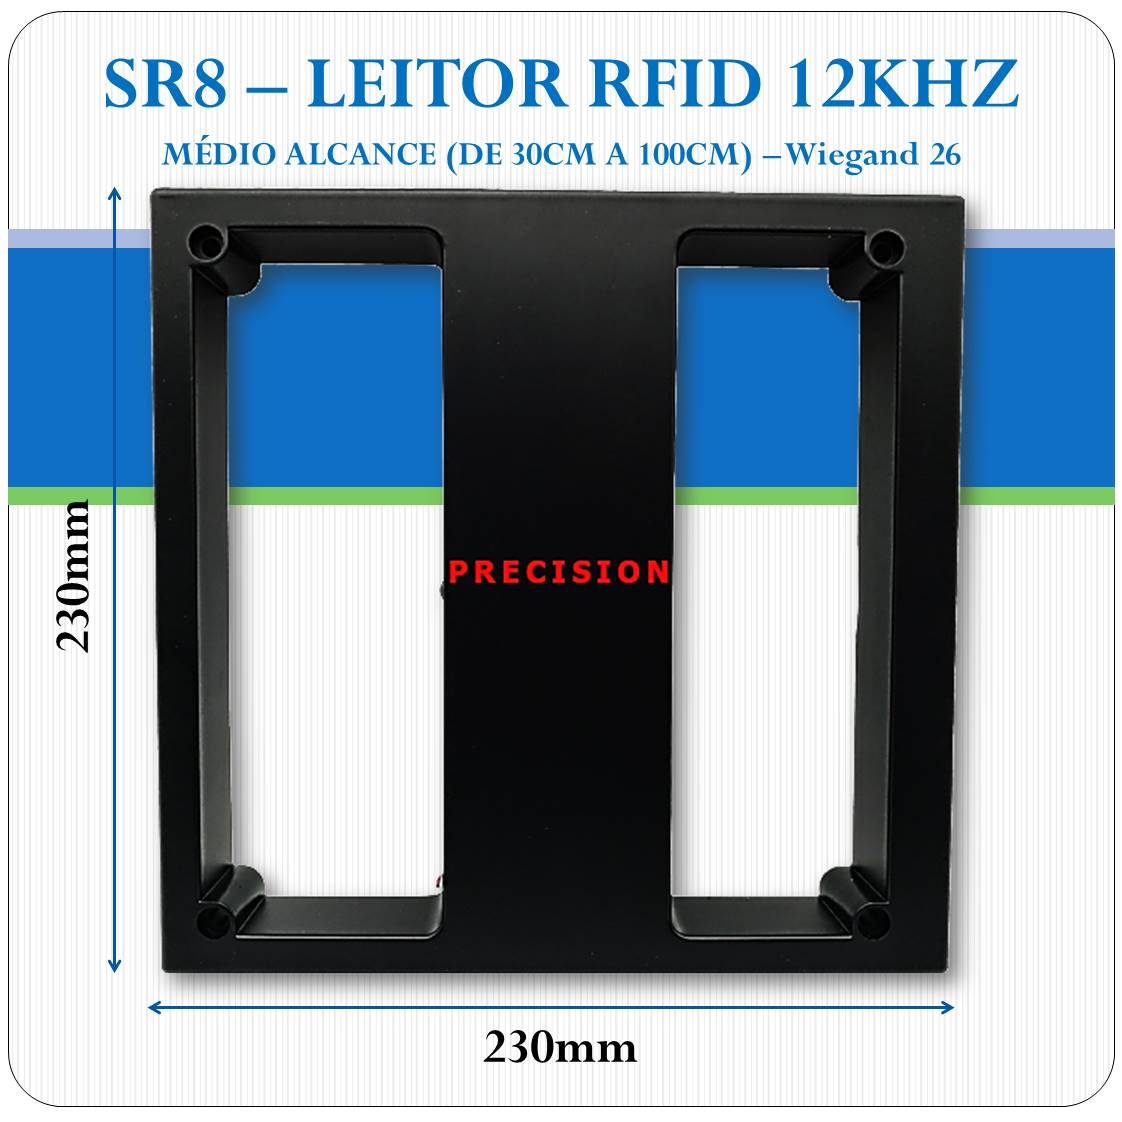 Leitor RFID 125Khz - Médio Alcance - Wiegand 26 - SR8